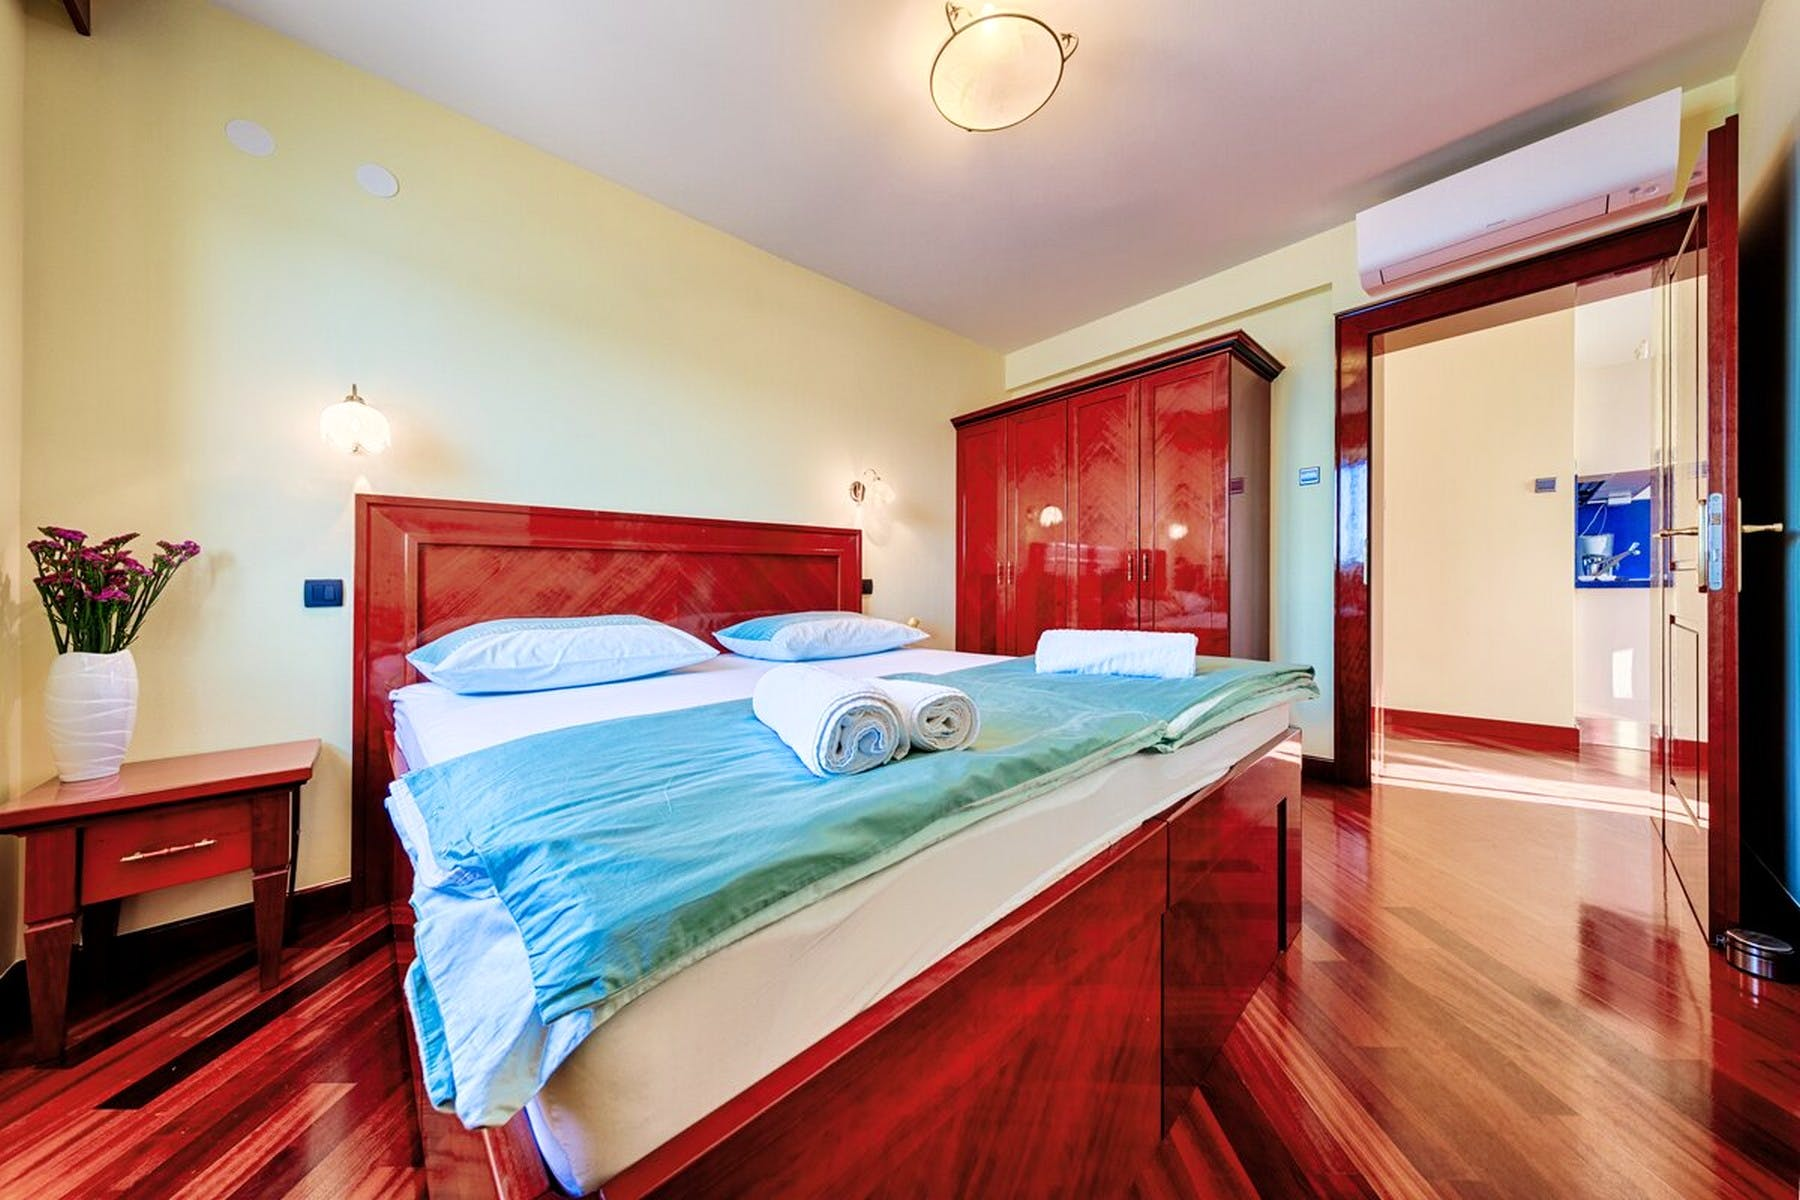 Glavna spavaonica s velikim krevetom